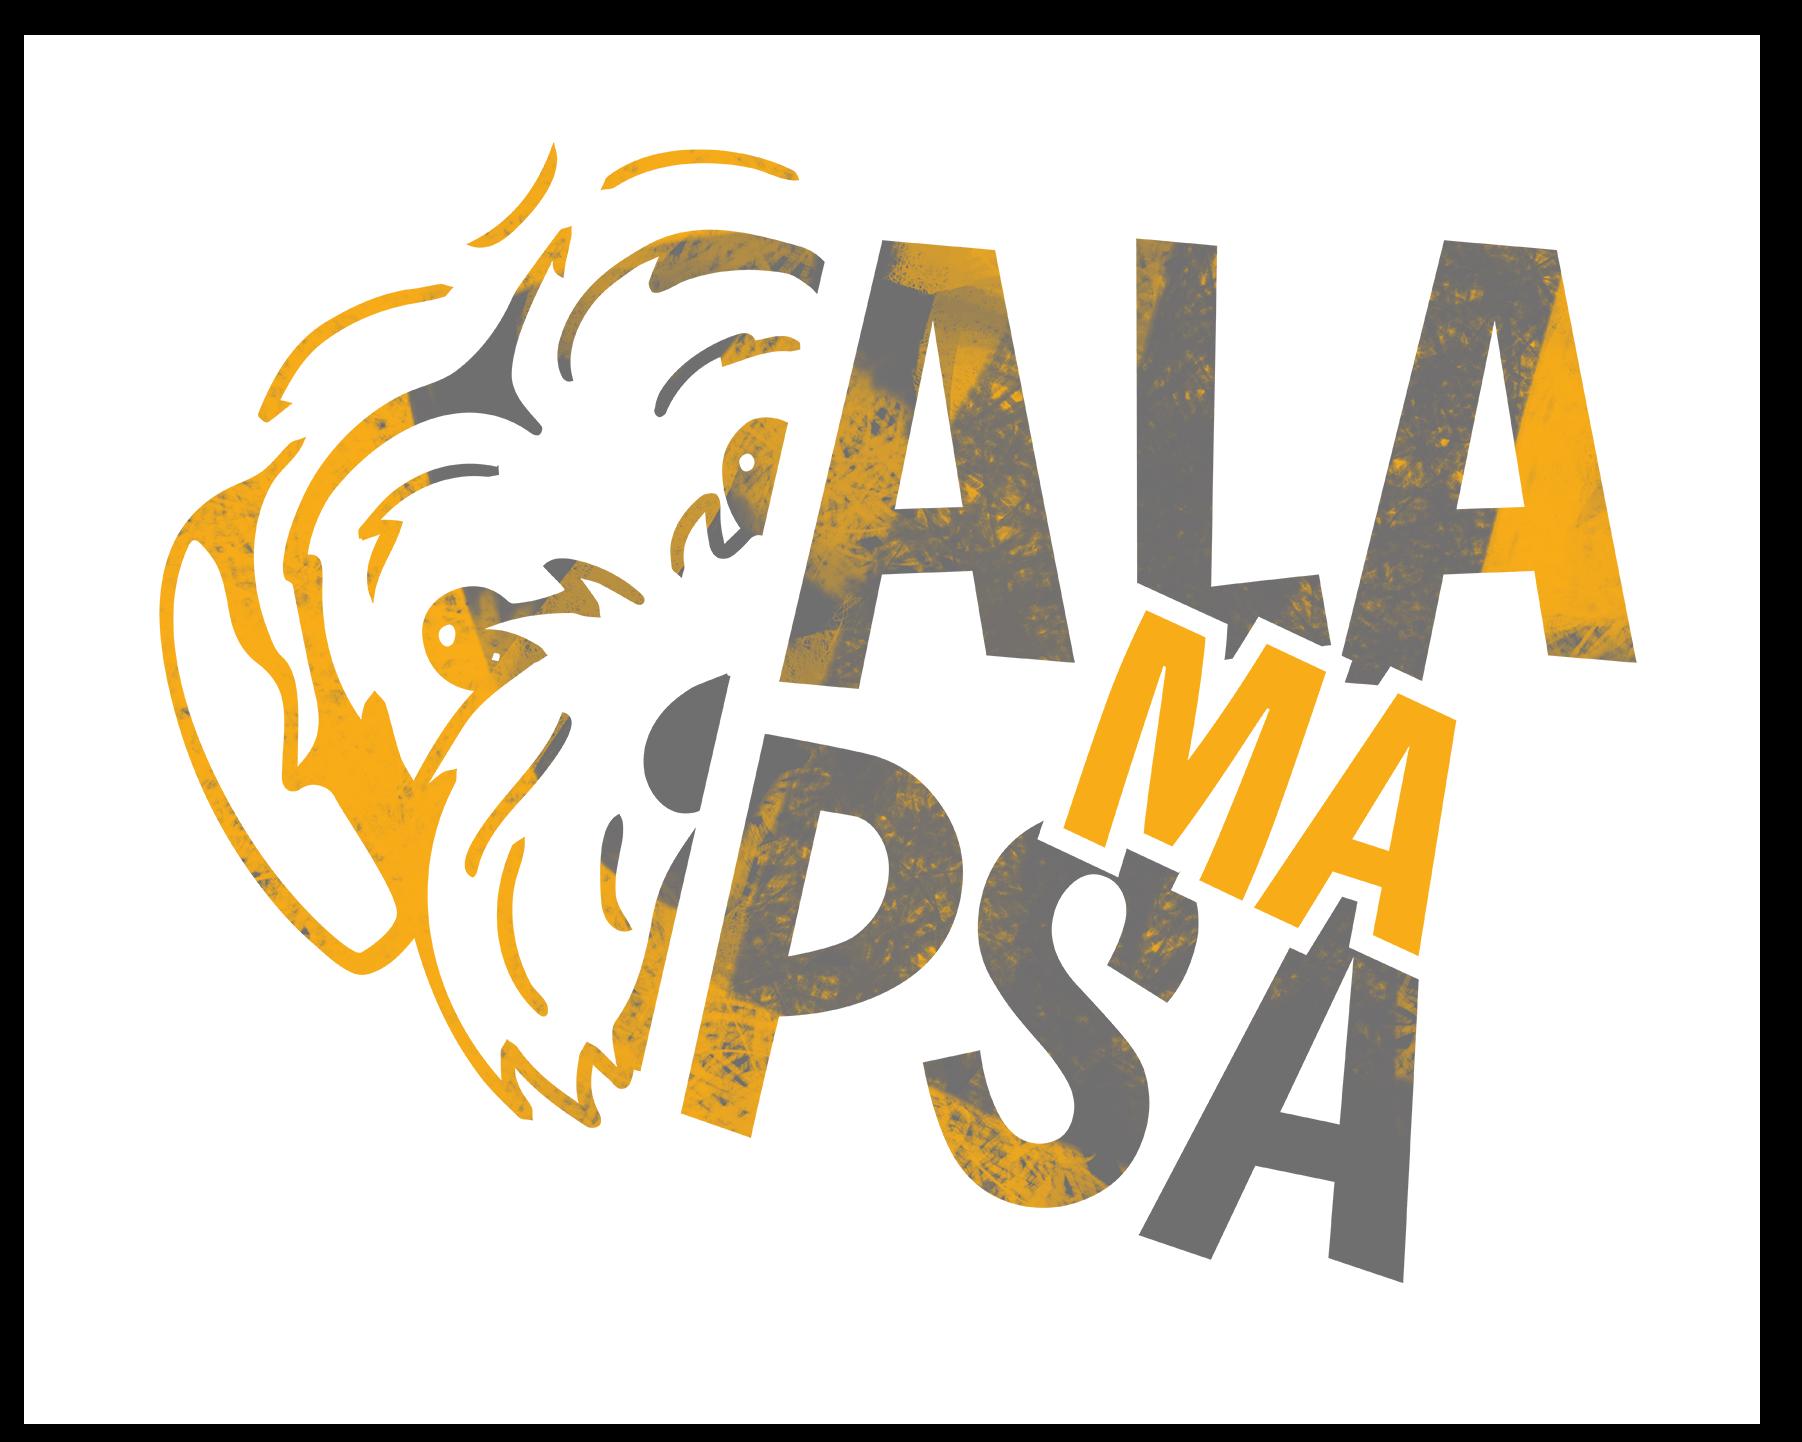 Ala ma Psa | Blog na czterech łapach